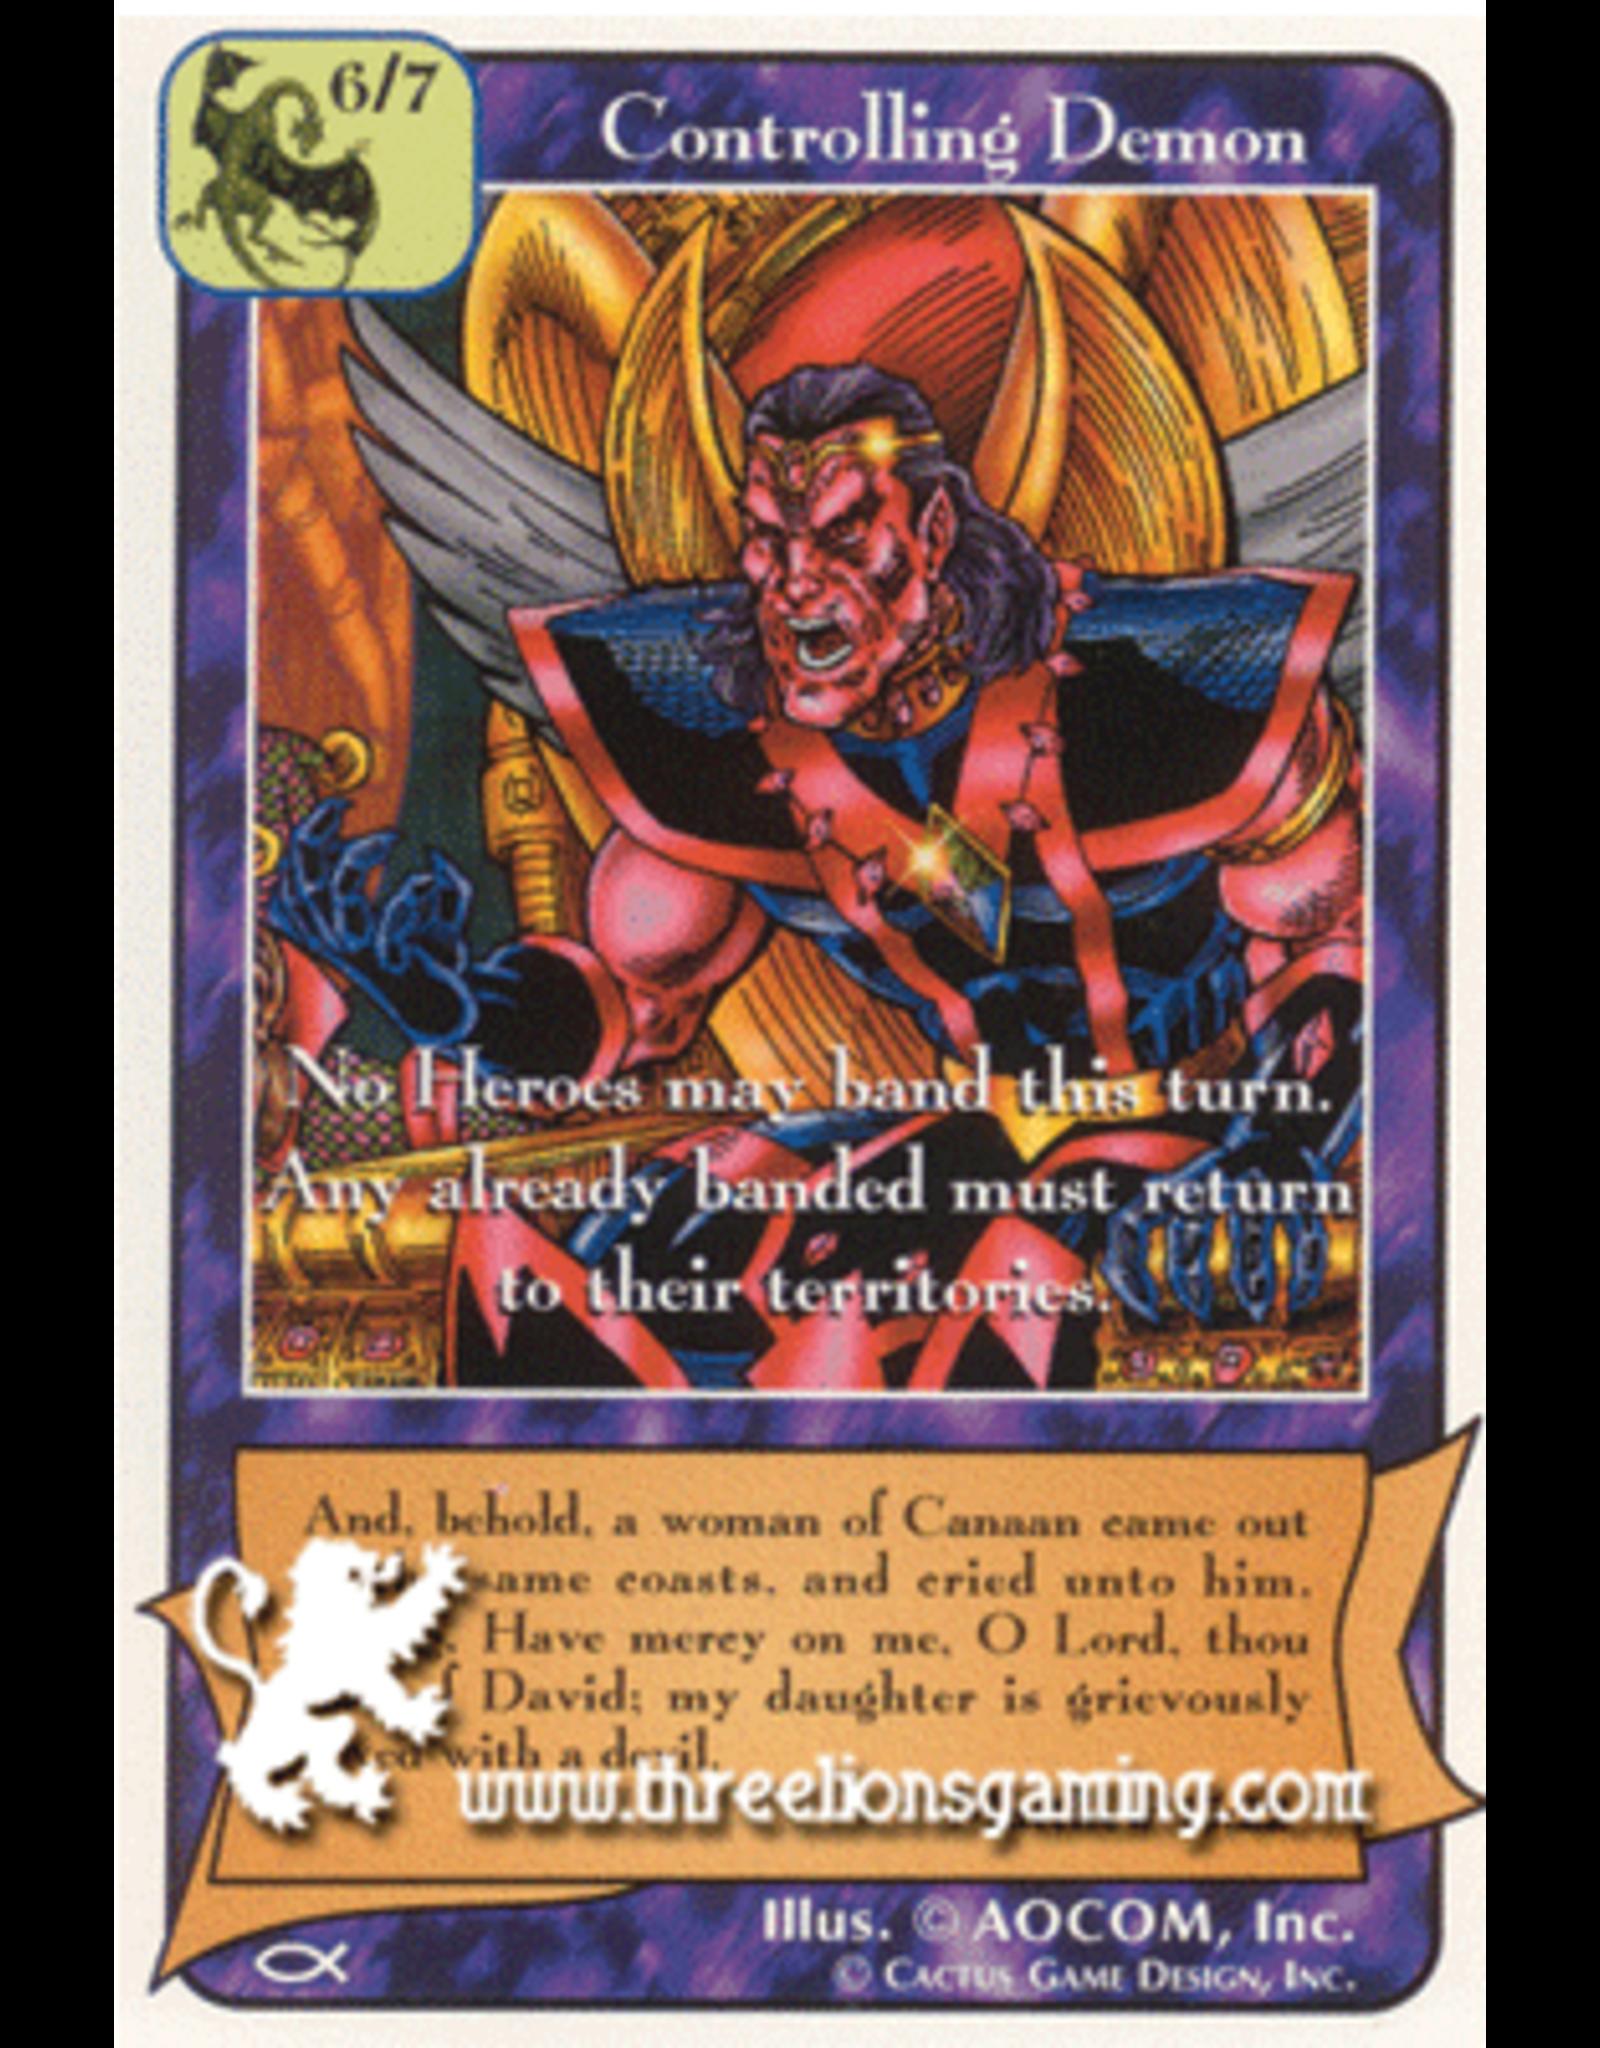 Ap: Controlling Demon